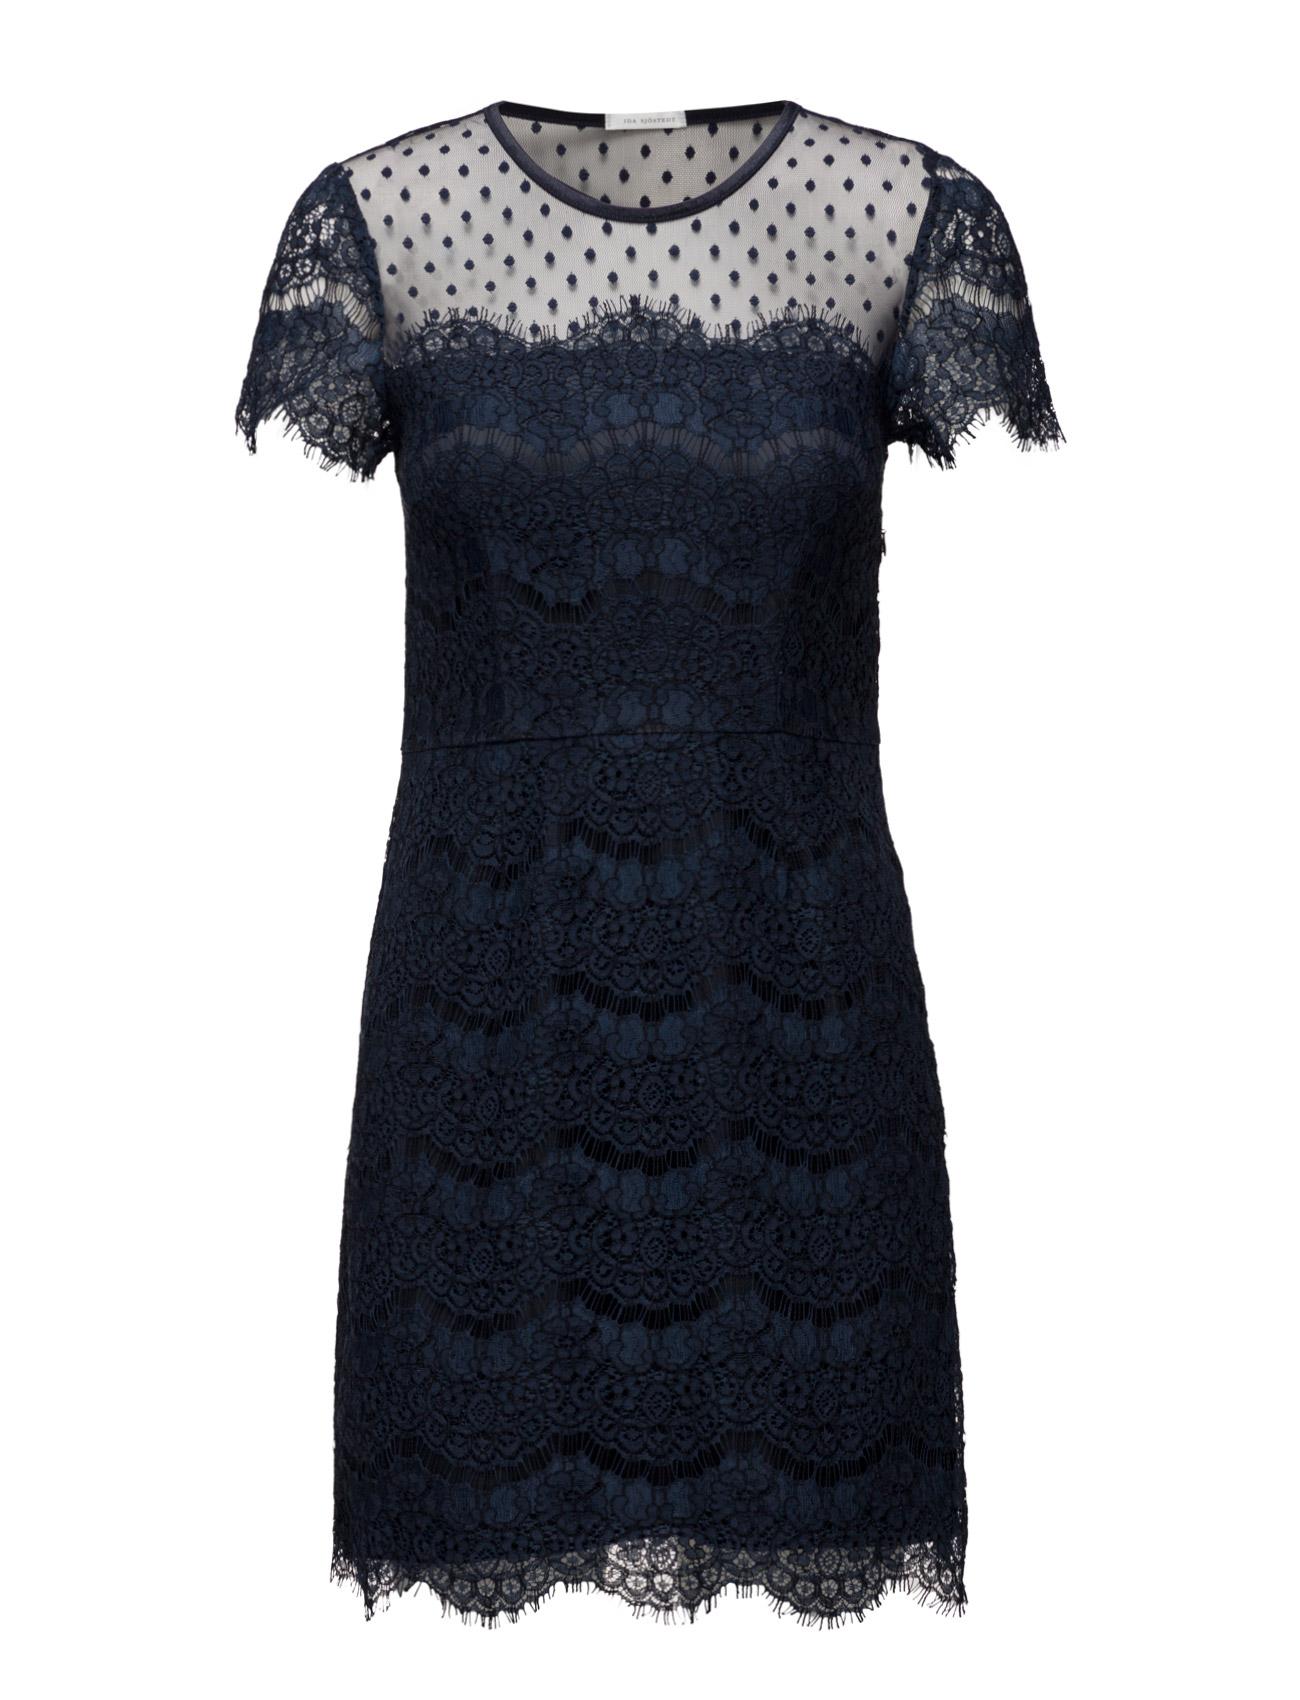 ida sjã¶stedt – Variety dress på boozt.com dk